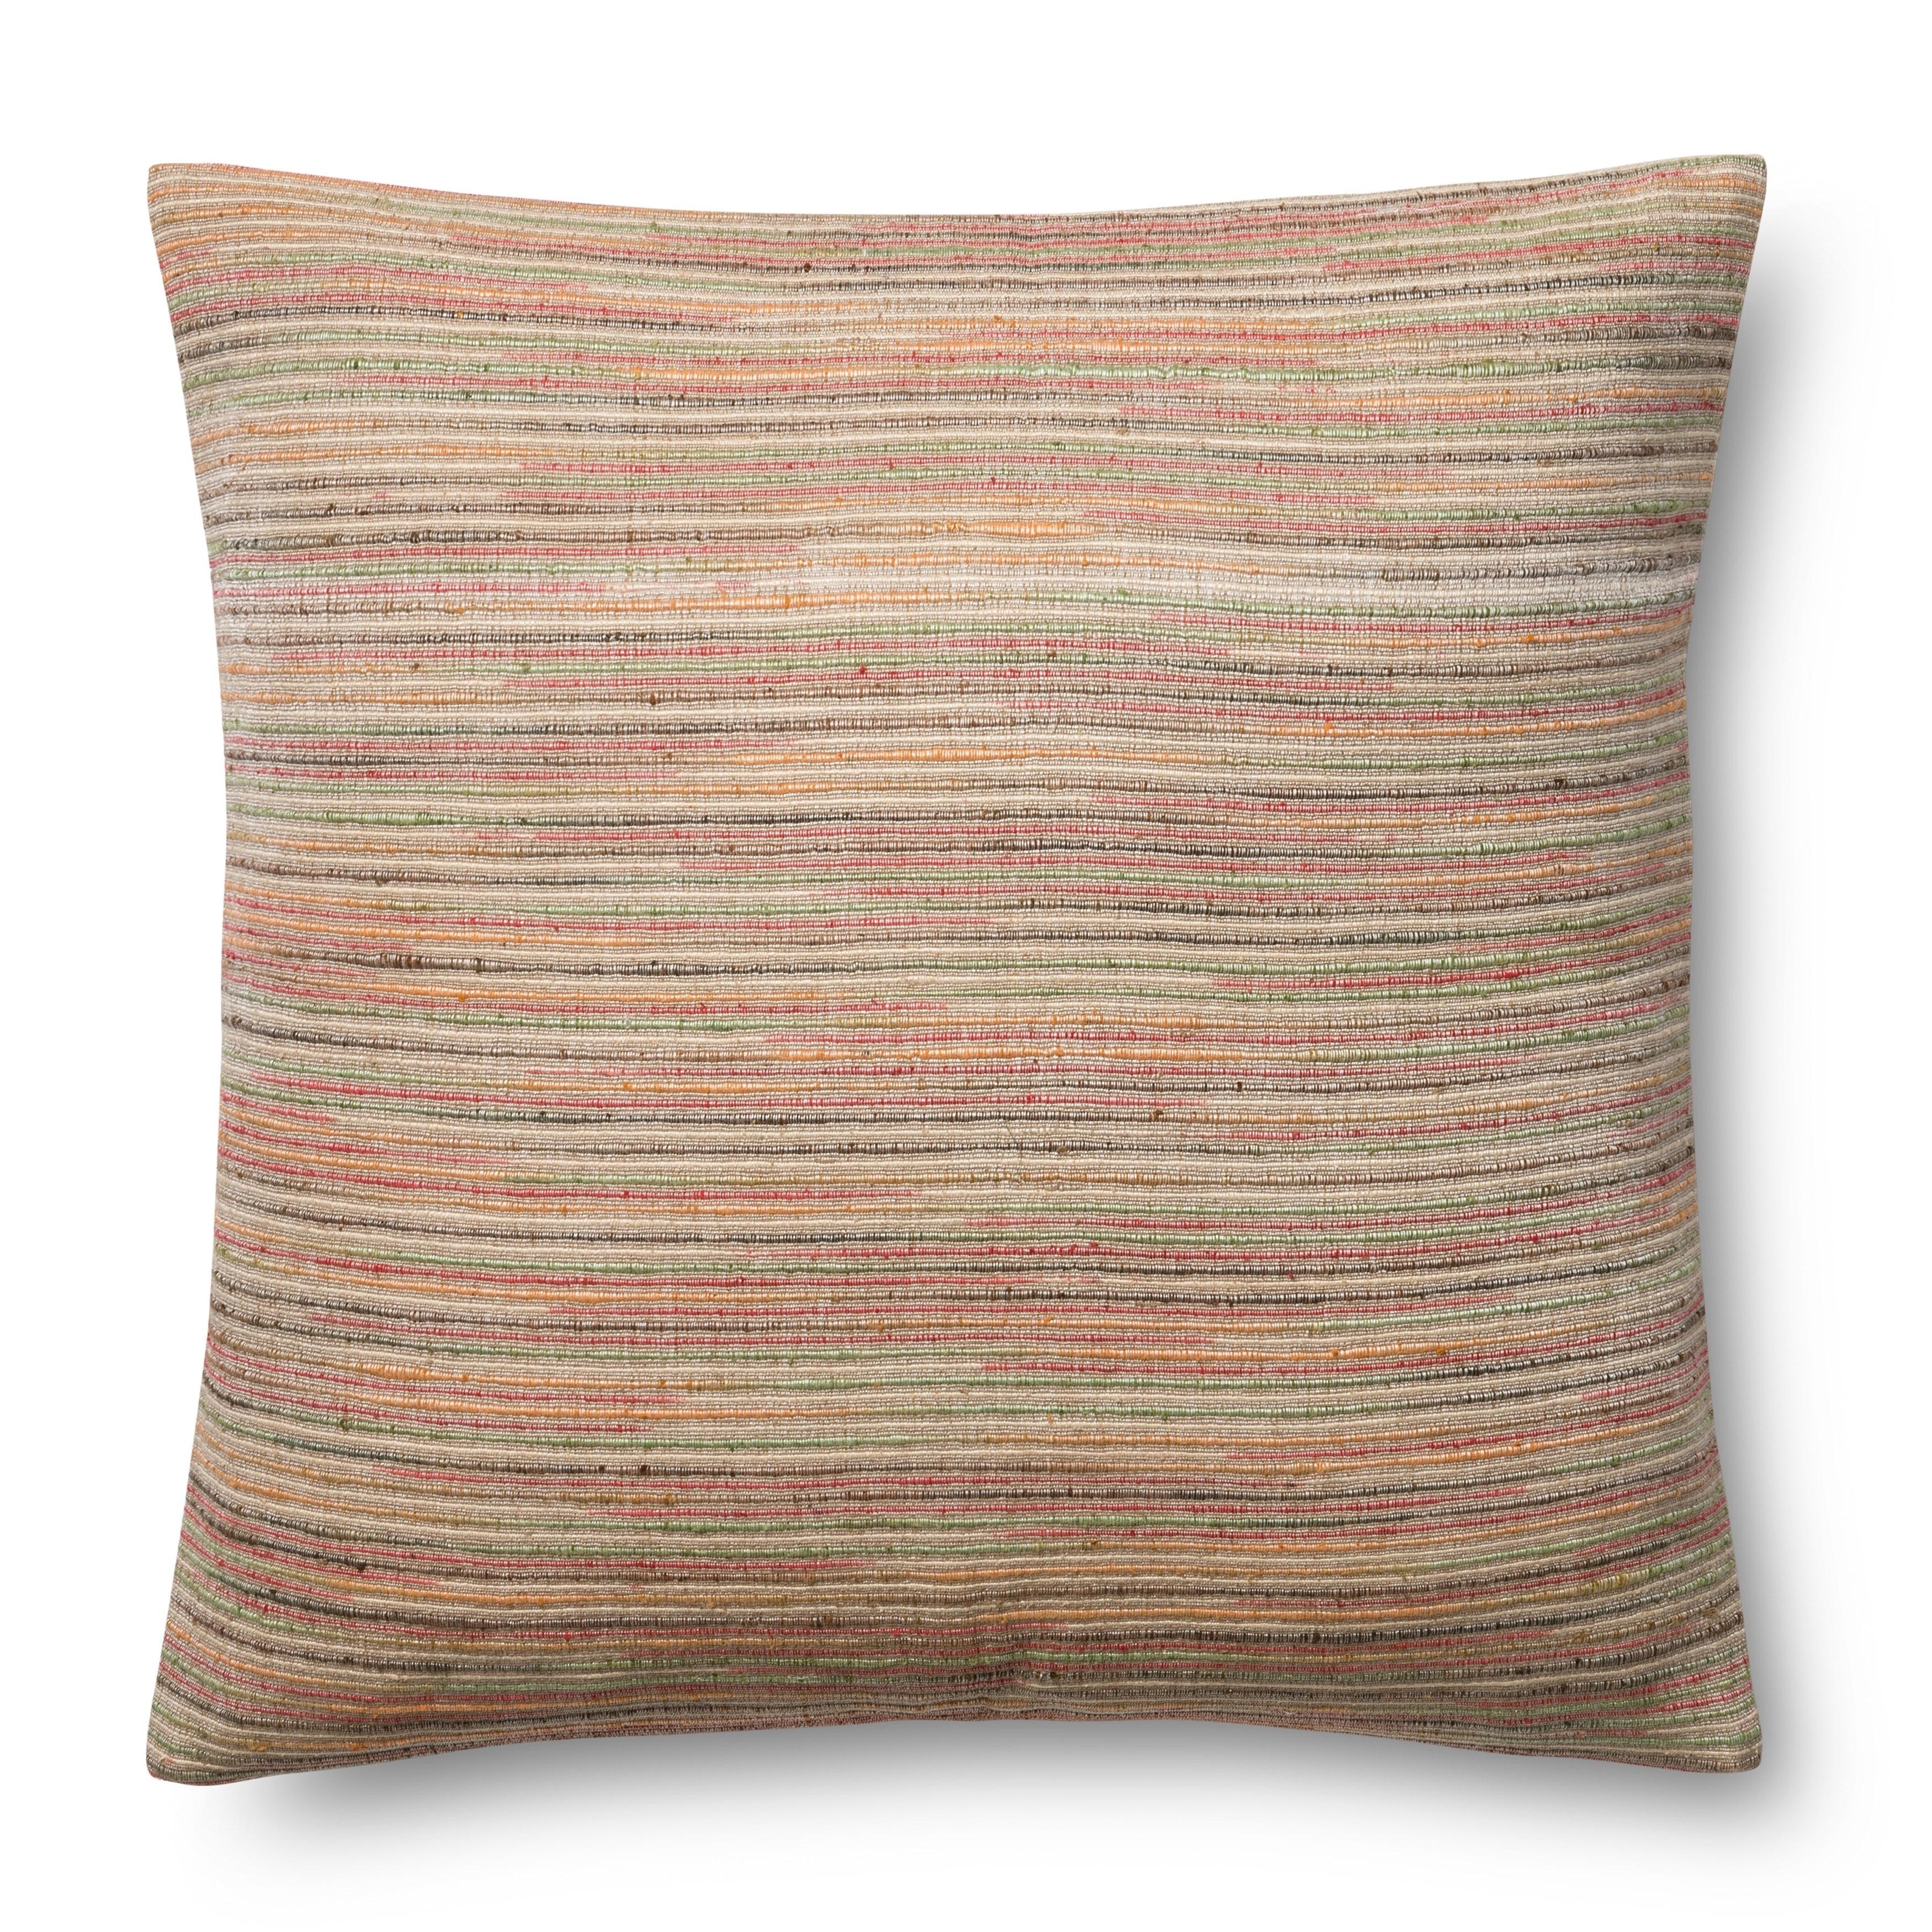 Woven Beige Multi Striped 22 Inch Pillow Cover